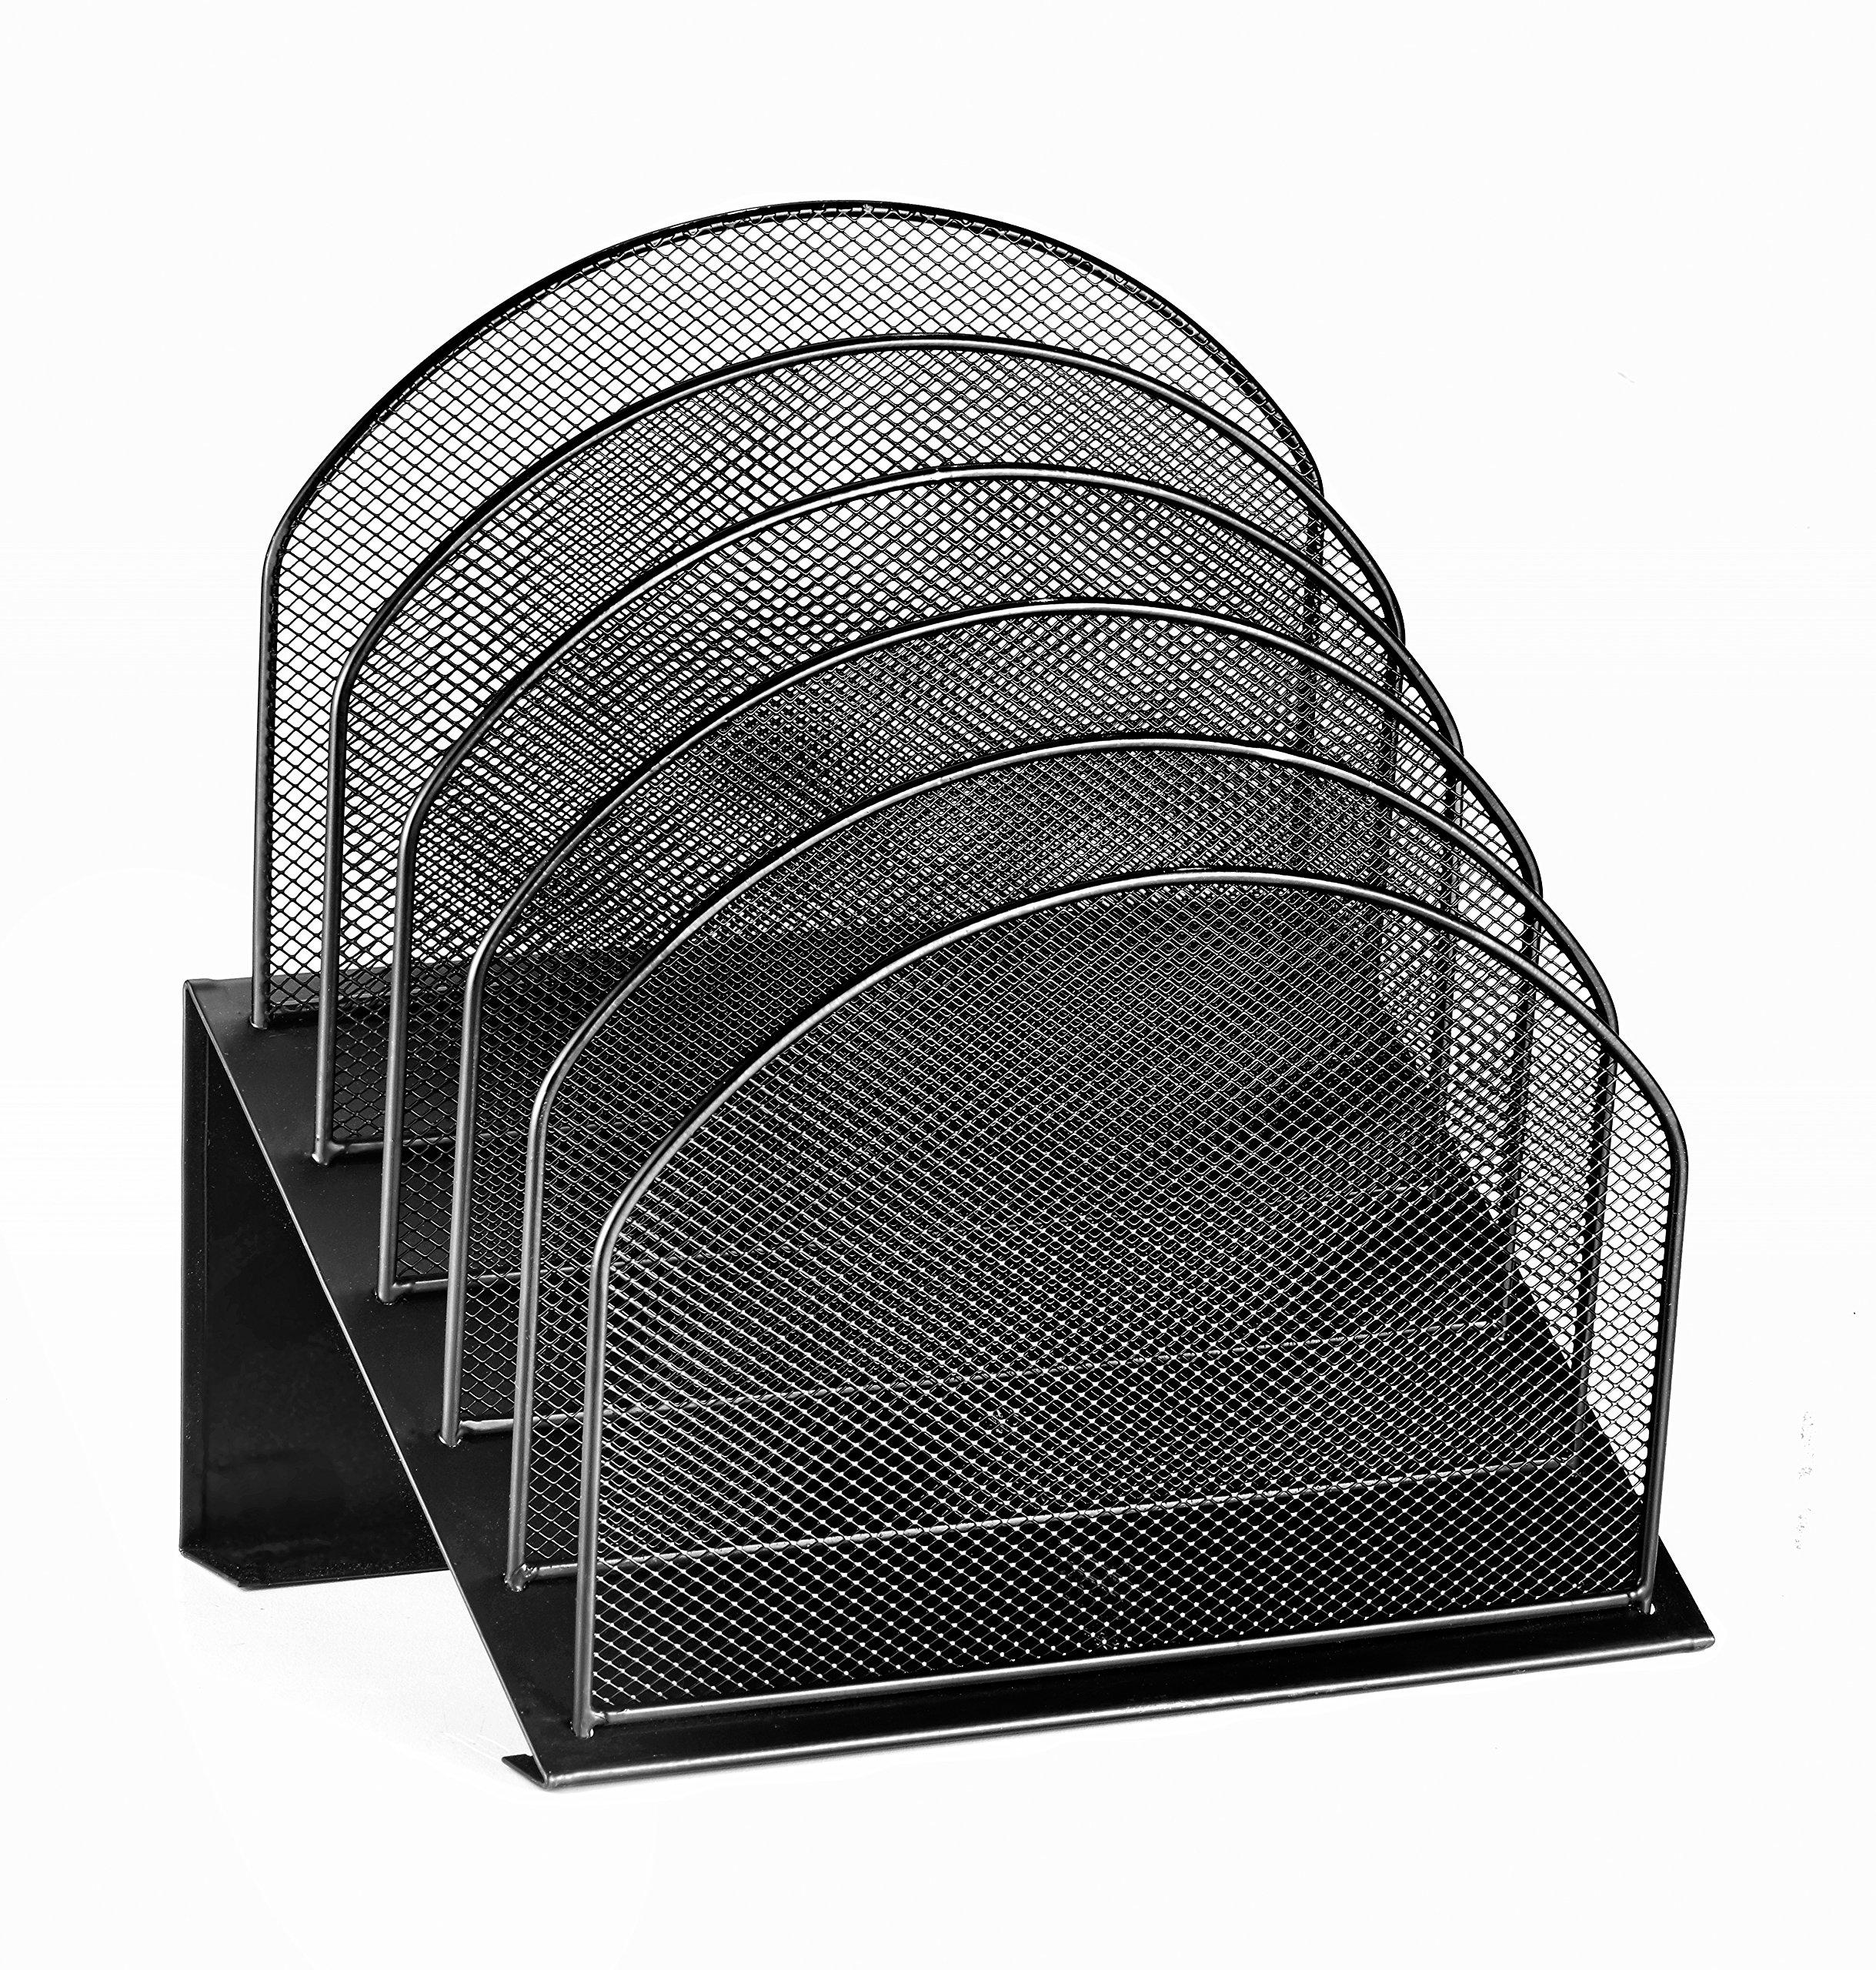 AdirOffice Mesh 5 Slot Section Desk Organizer Sorter - Desktop Incline Caddy (Black)